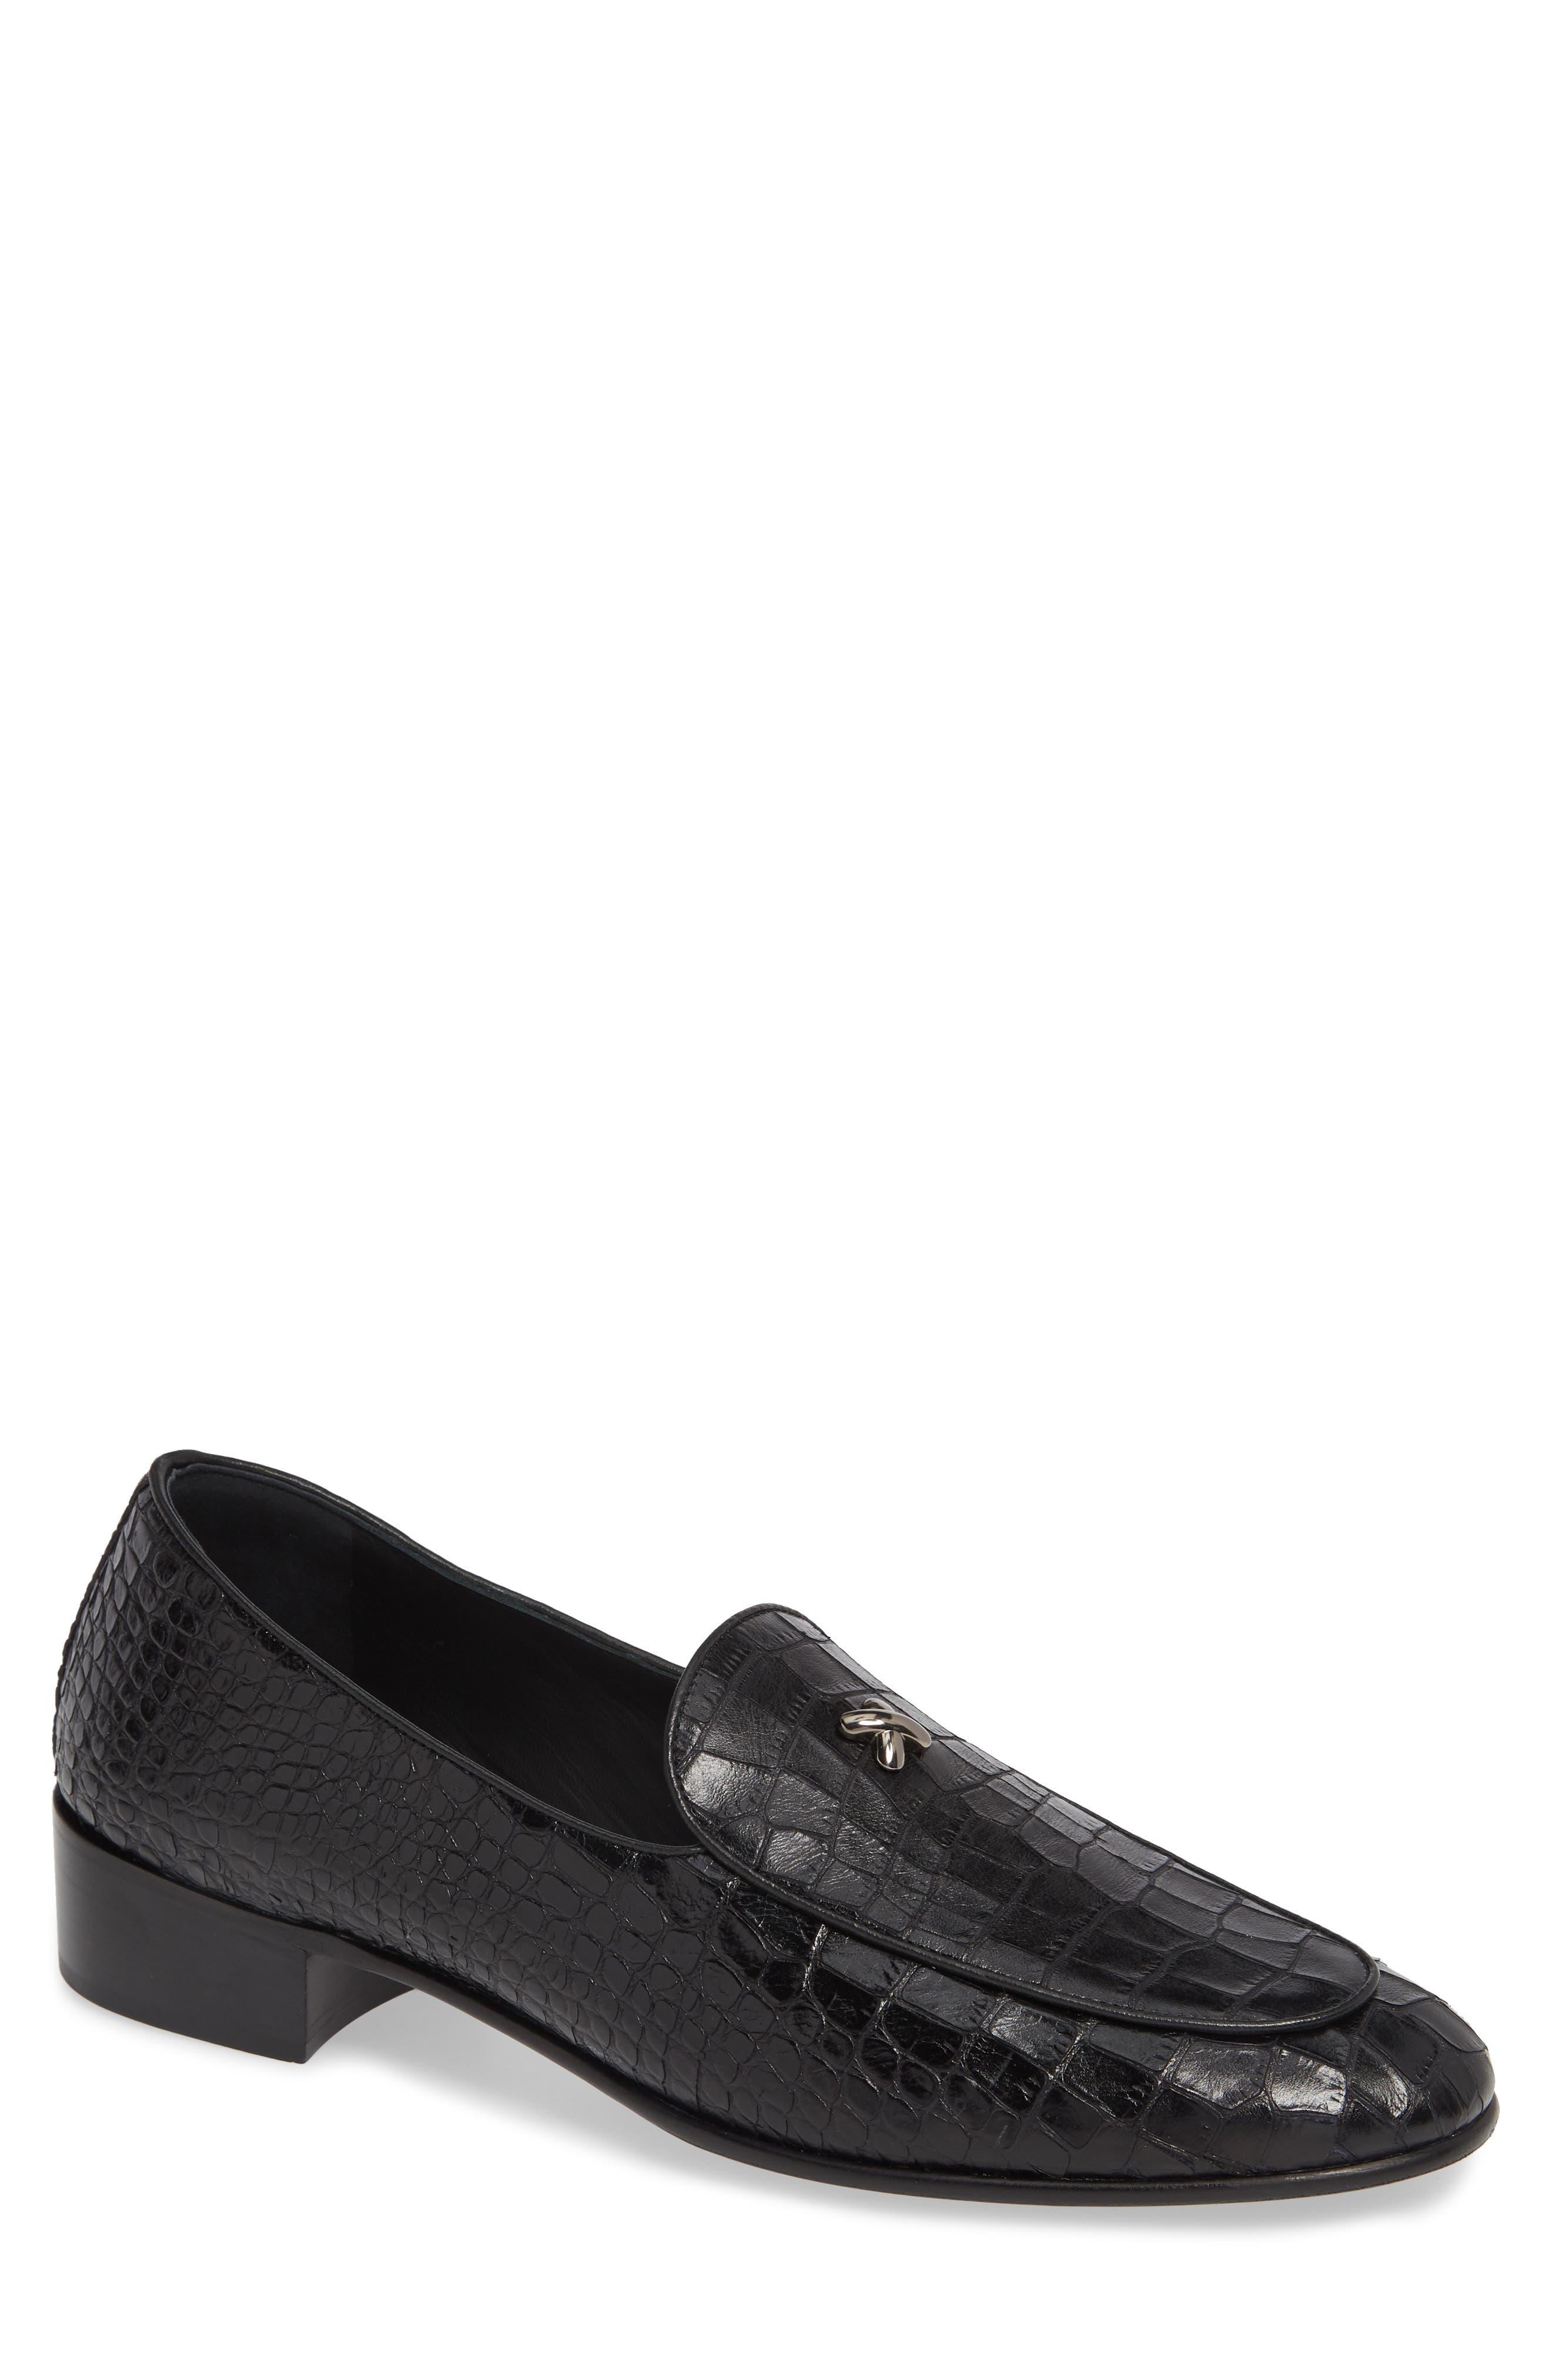 a63e35d7288 Giuseppe Zanotti - Men s Casual Fashion Shoes and Sneakers